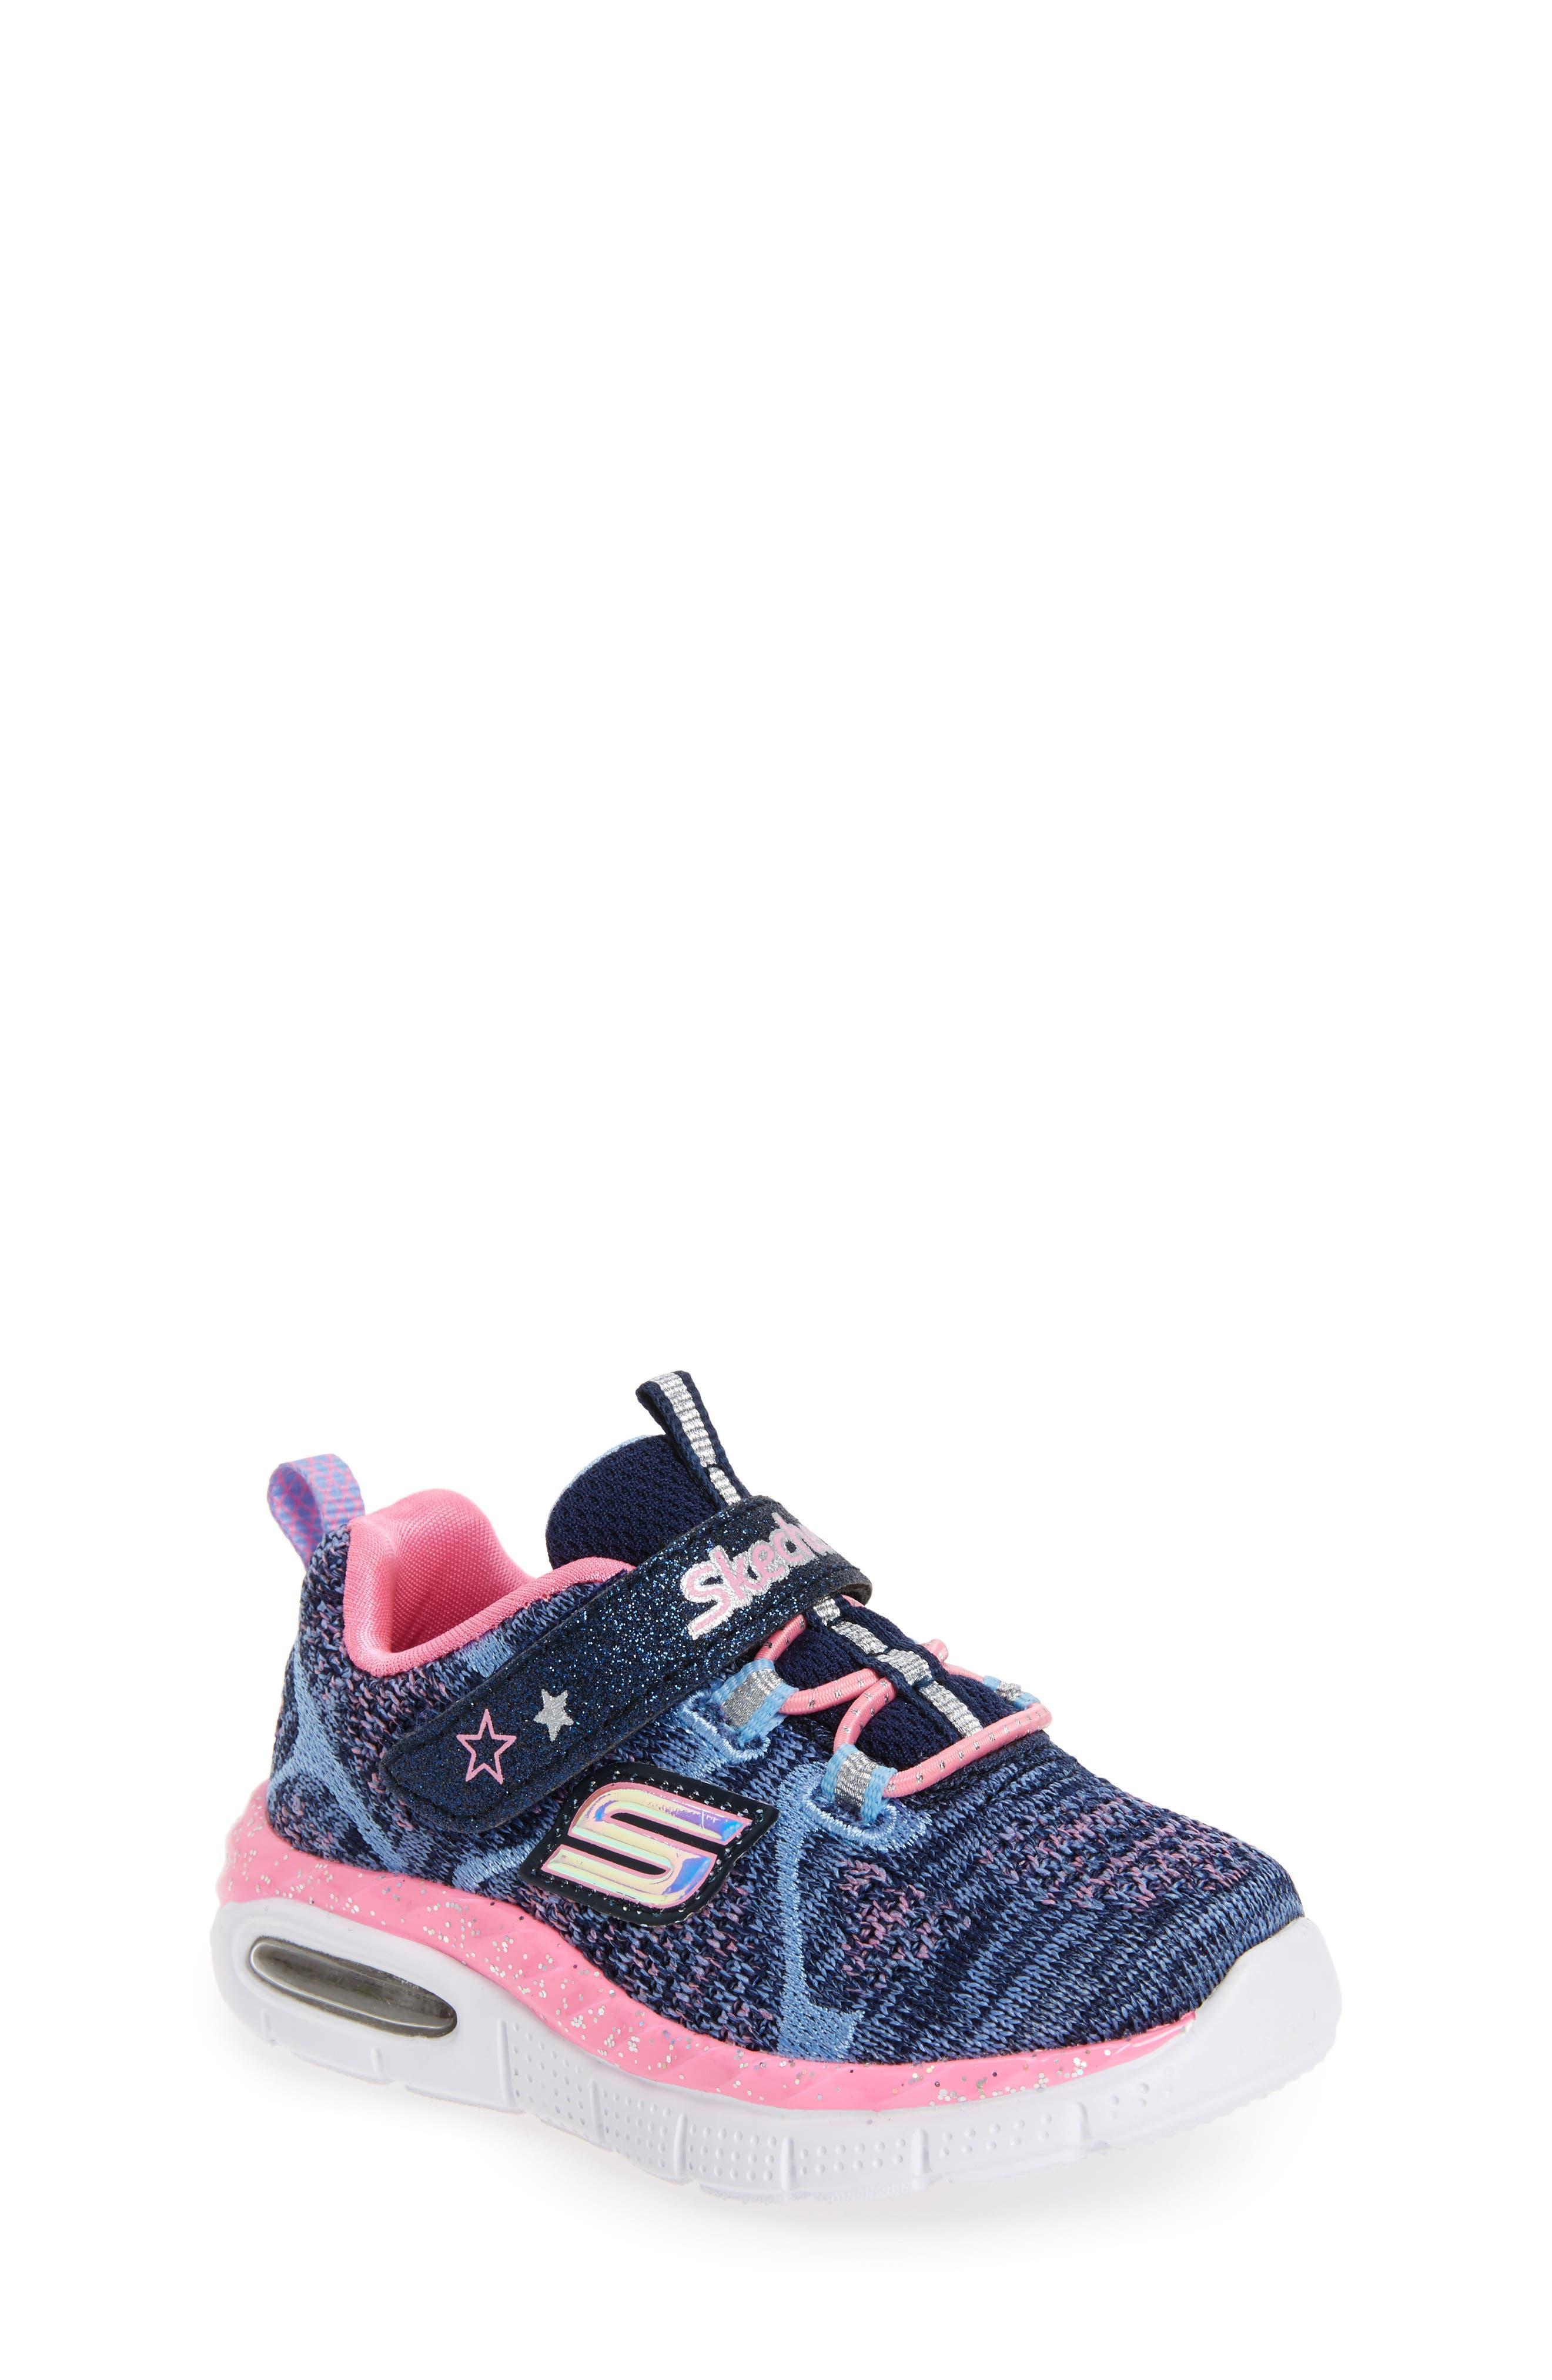 SKECHERS Air Appeal Breezy Baby Sneaker